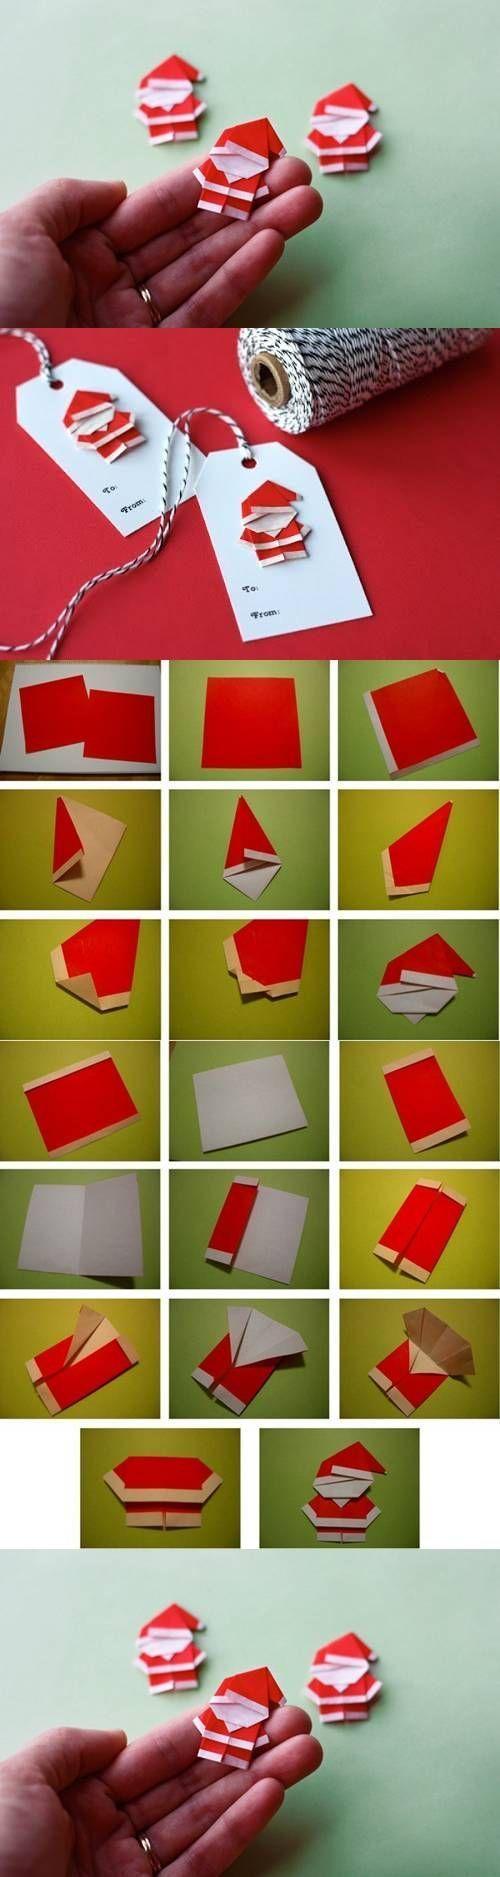 Lucky Elephant Tank - Ivory @Heidi Haugen Haugen Haugen Haugen Haugen Gaber Check out the website to see more  #CITstudios #Papercraft #Origami